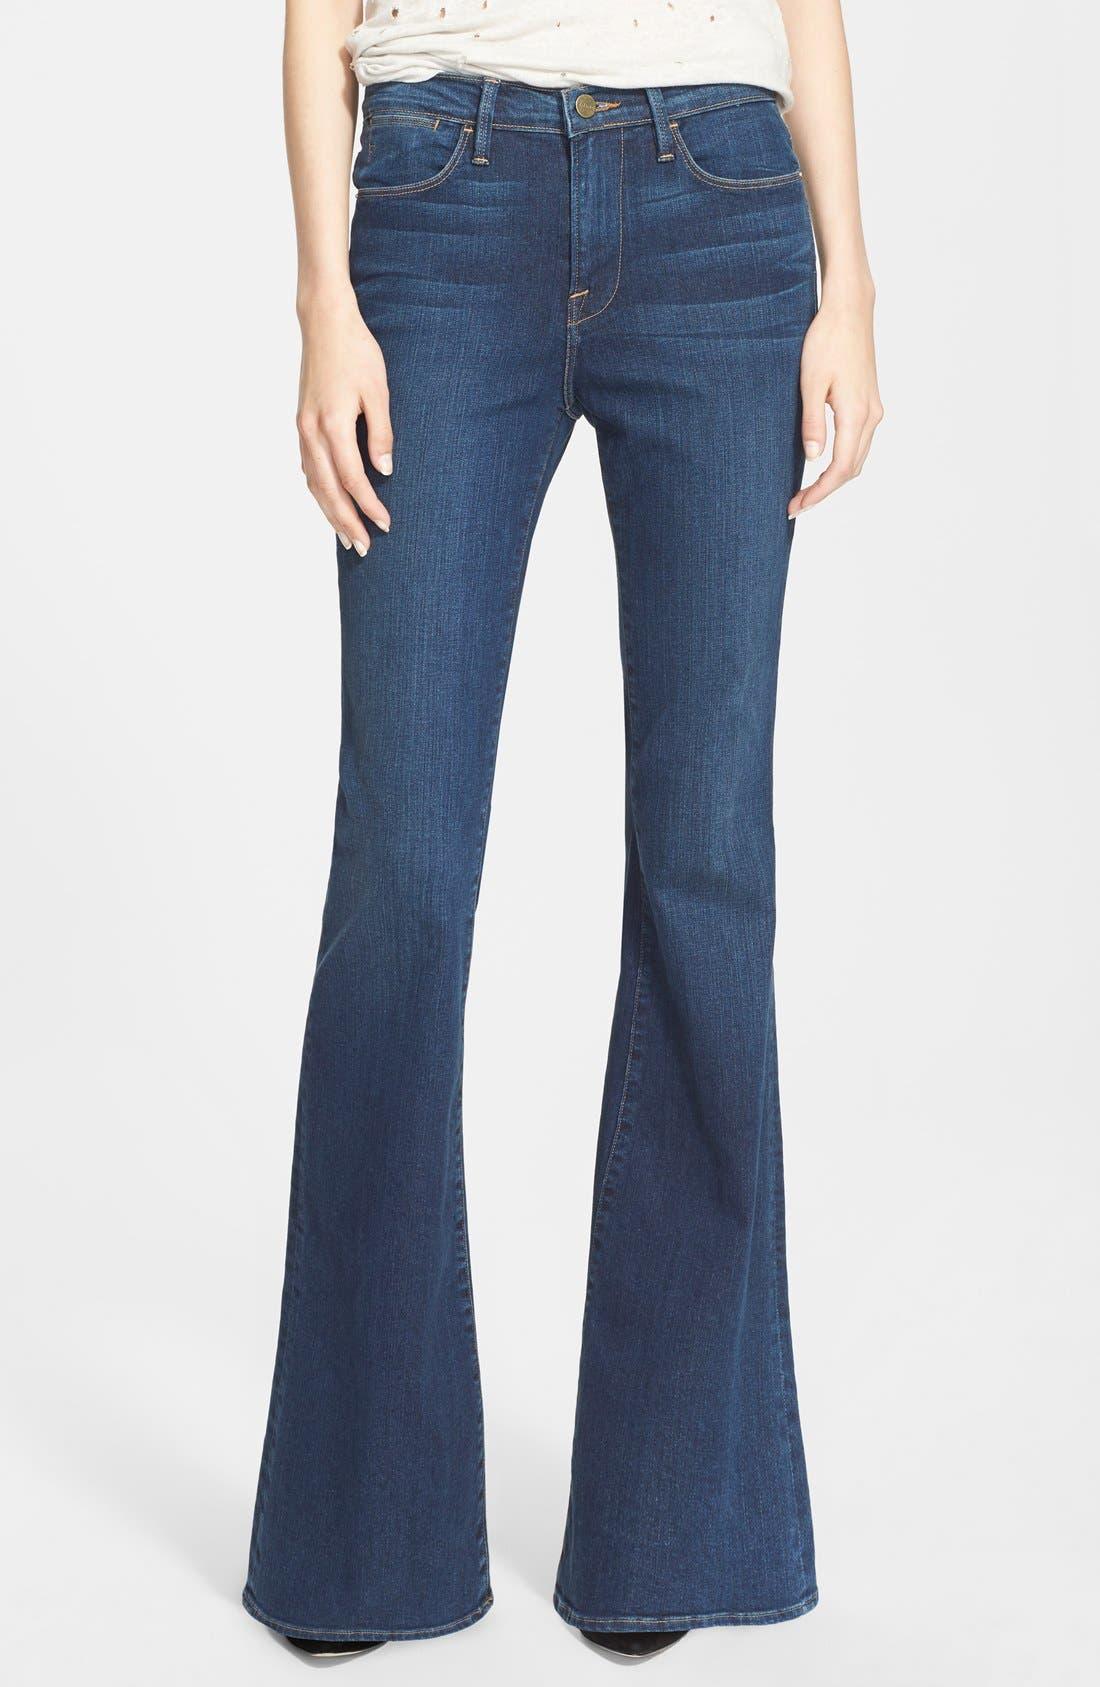 FRAME, Denim 'Le High Flare' Flare Leg Jeans, Main thumbnail 1, color, 401